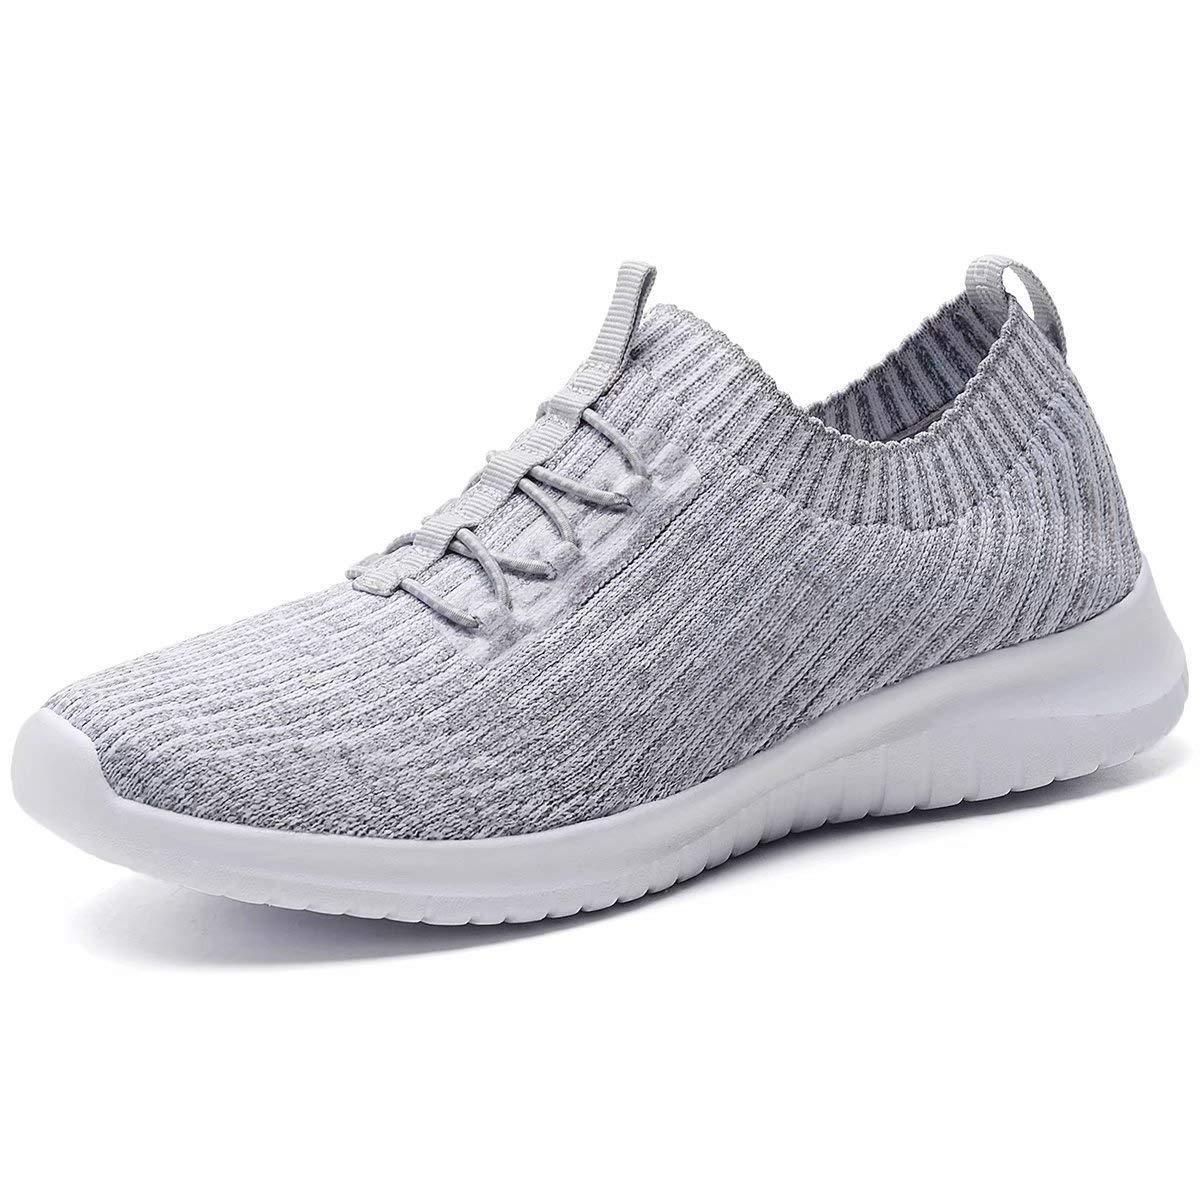 konhill Women s Comfortable Walking Shoes – Tennis Athletic Casual Slip on Sneakers